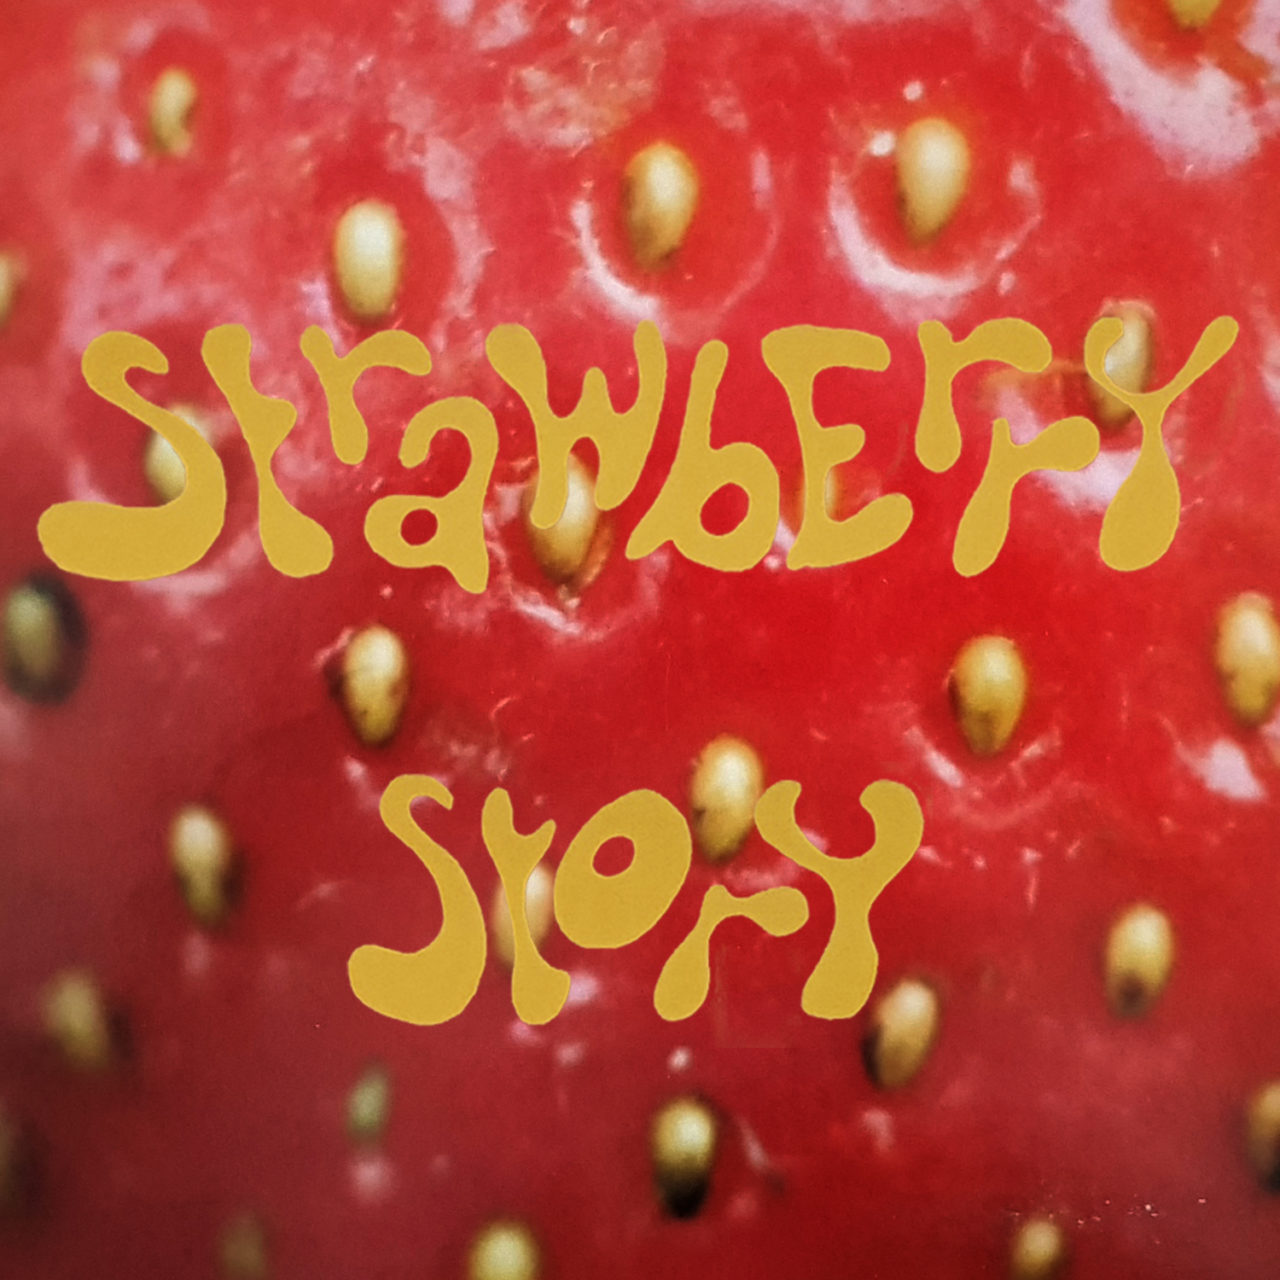 Strawberry Story music vide